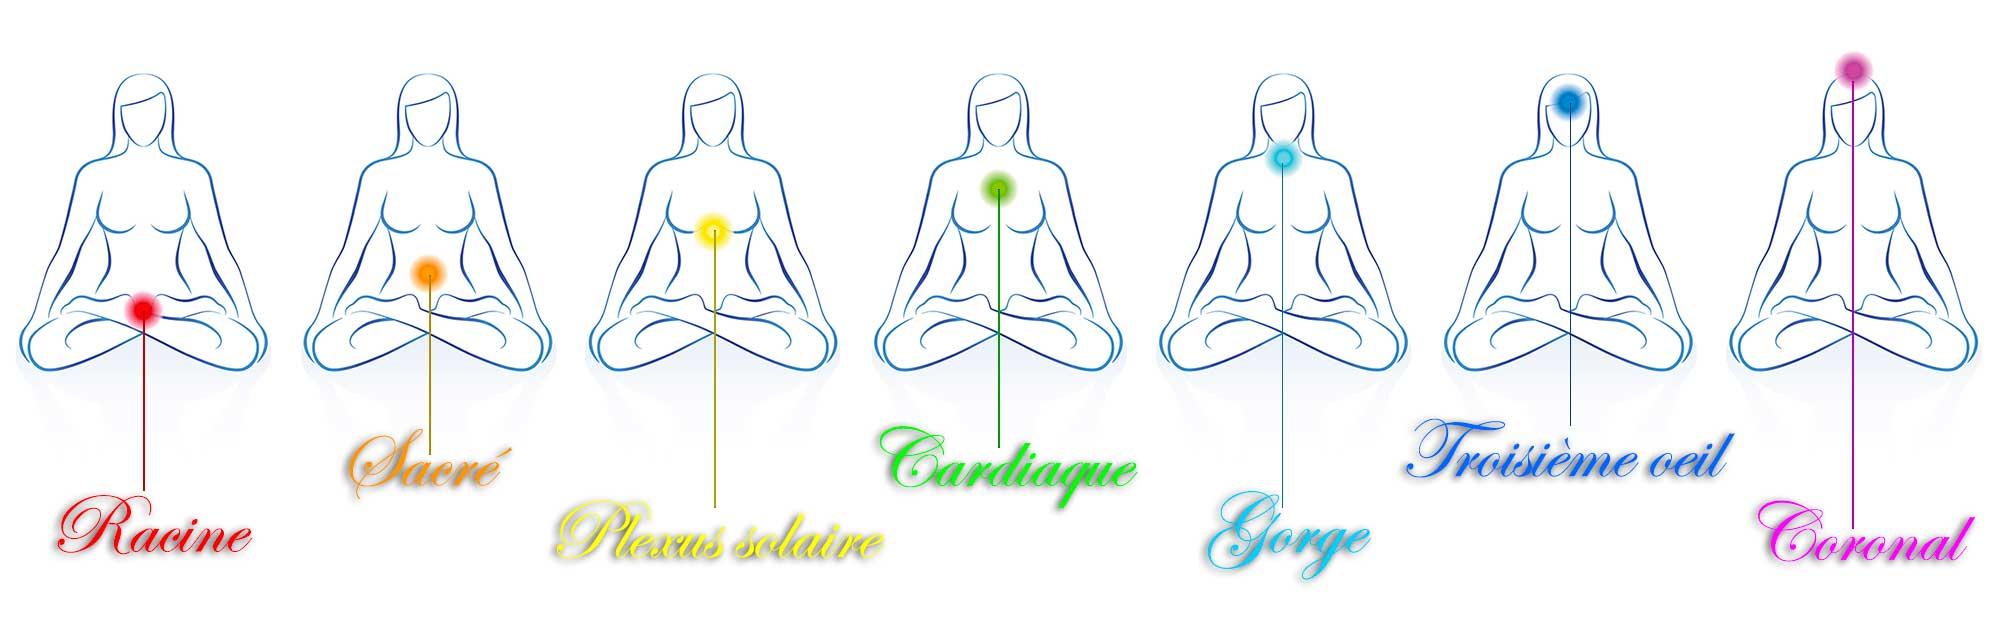 les 7 chakras principaux